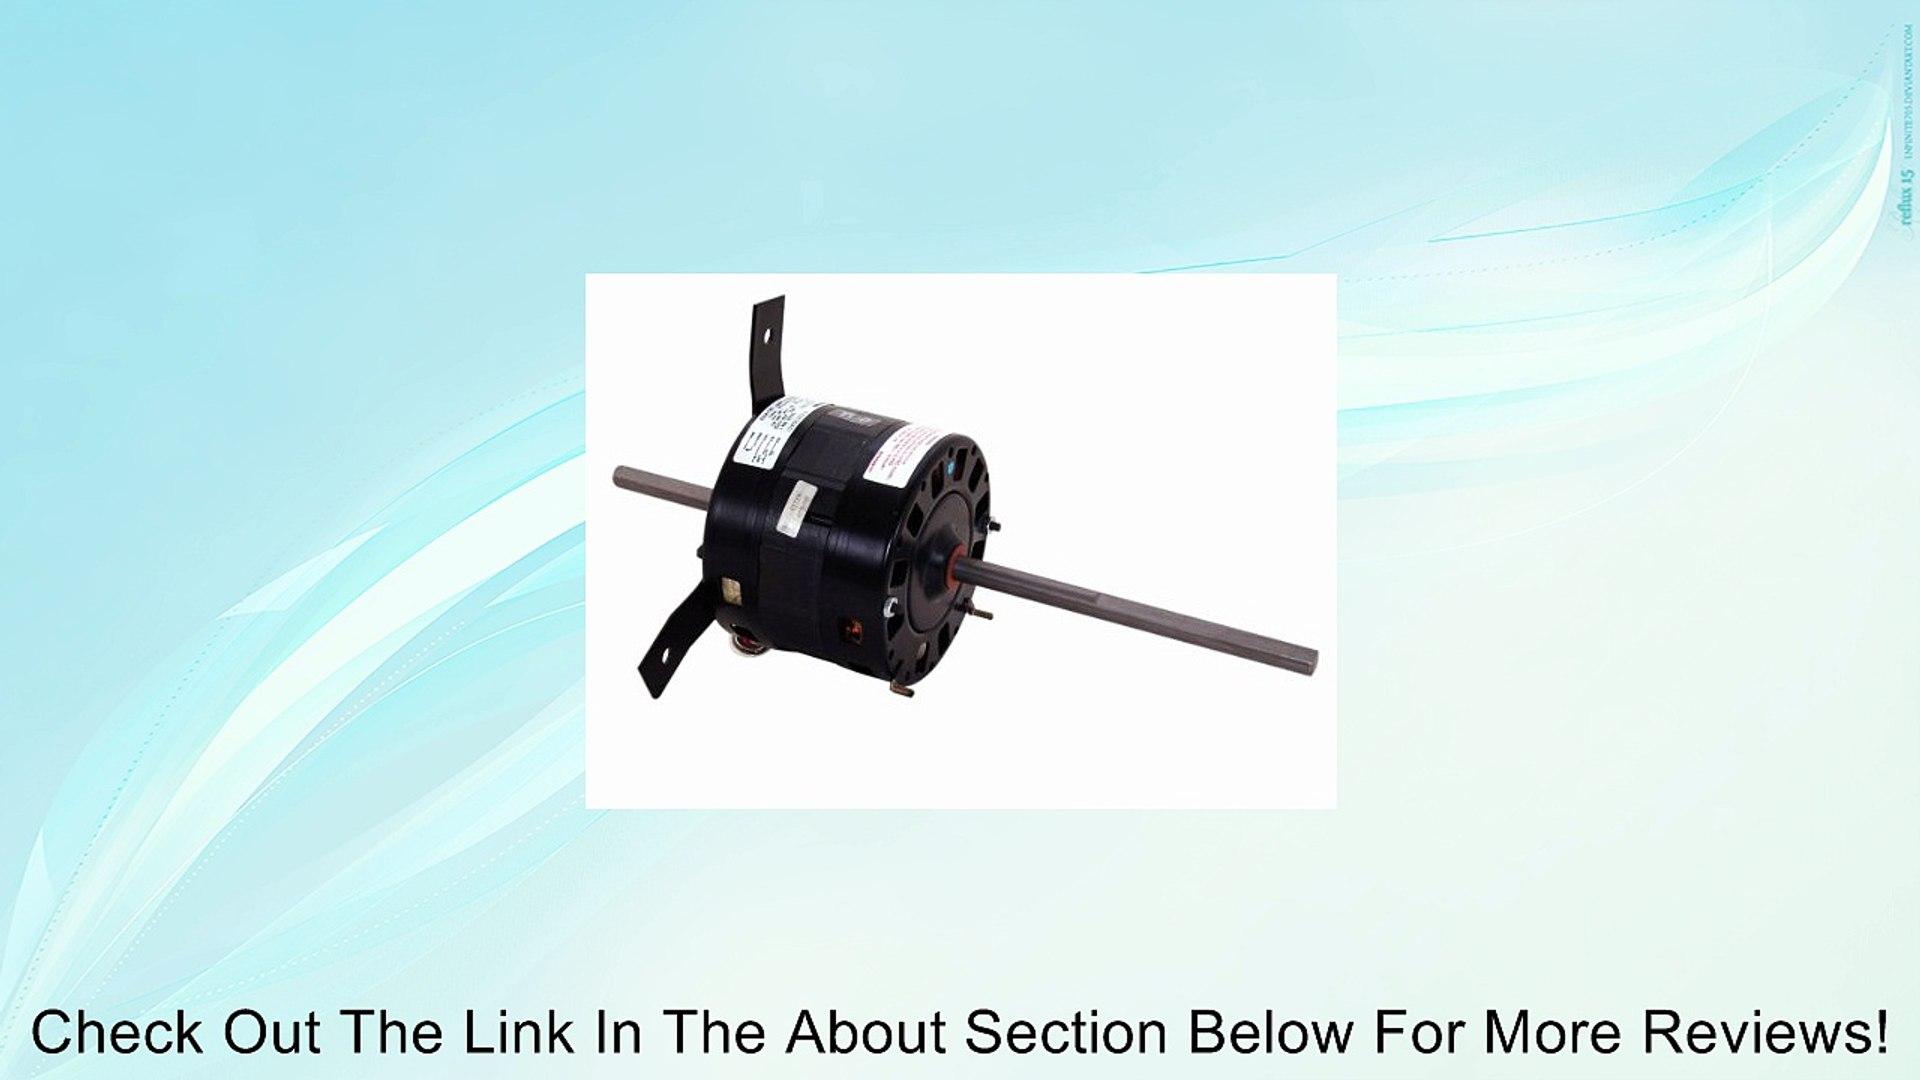 Btbtoc Car Steering Wheel Lock Adjustable T-Type Anti-Theft Lock Self-Defense Manual Tool